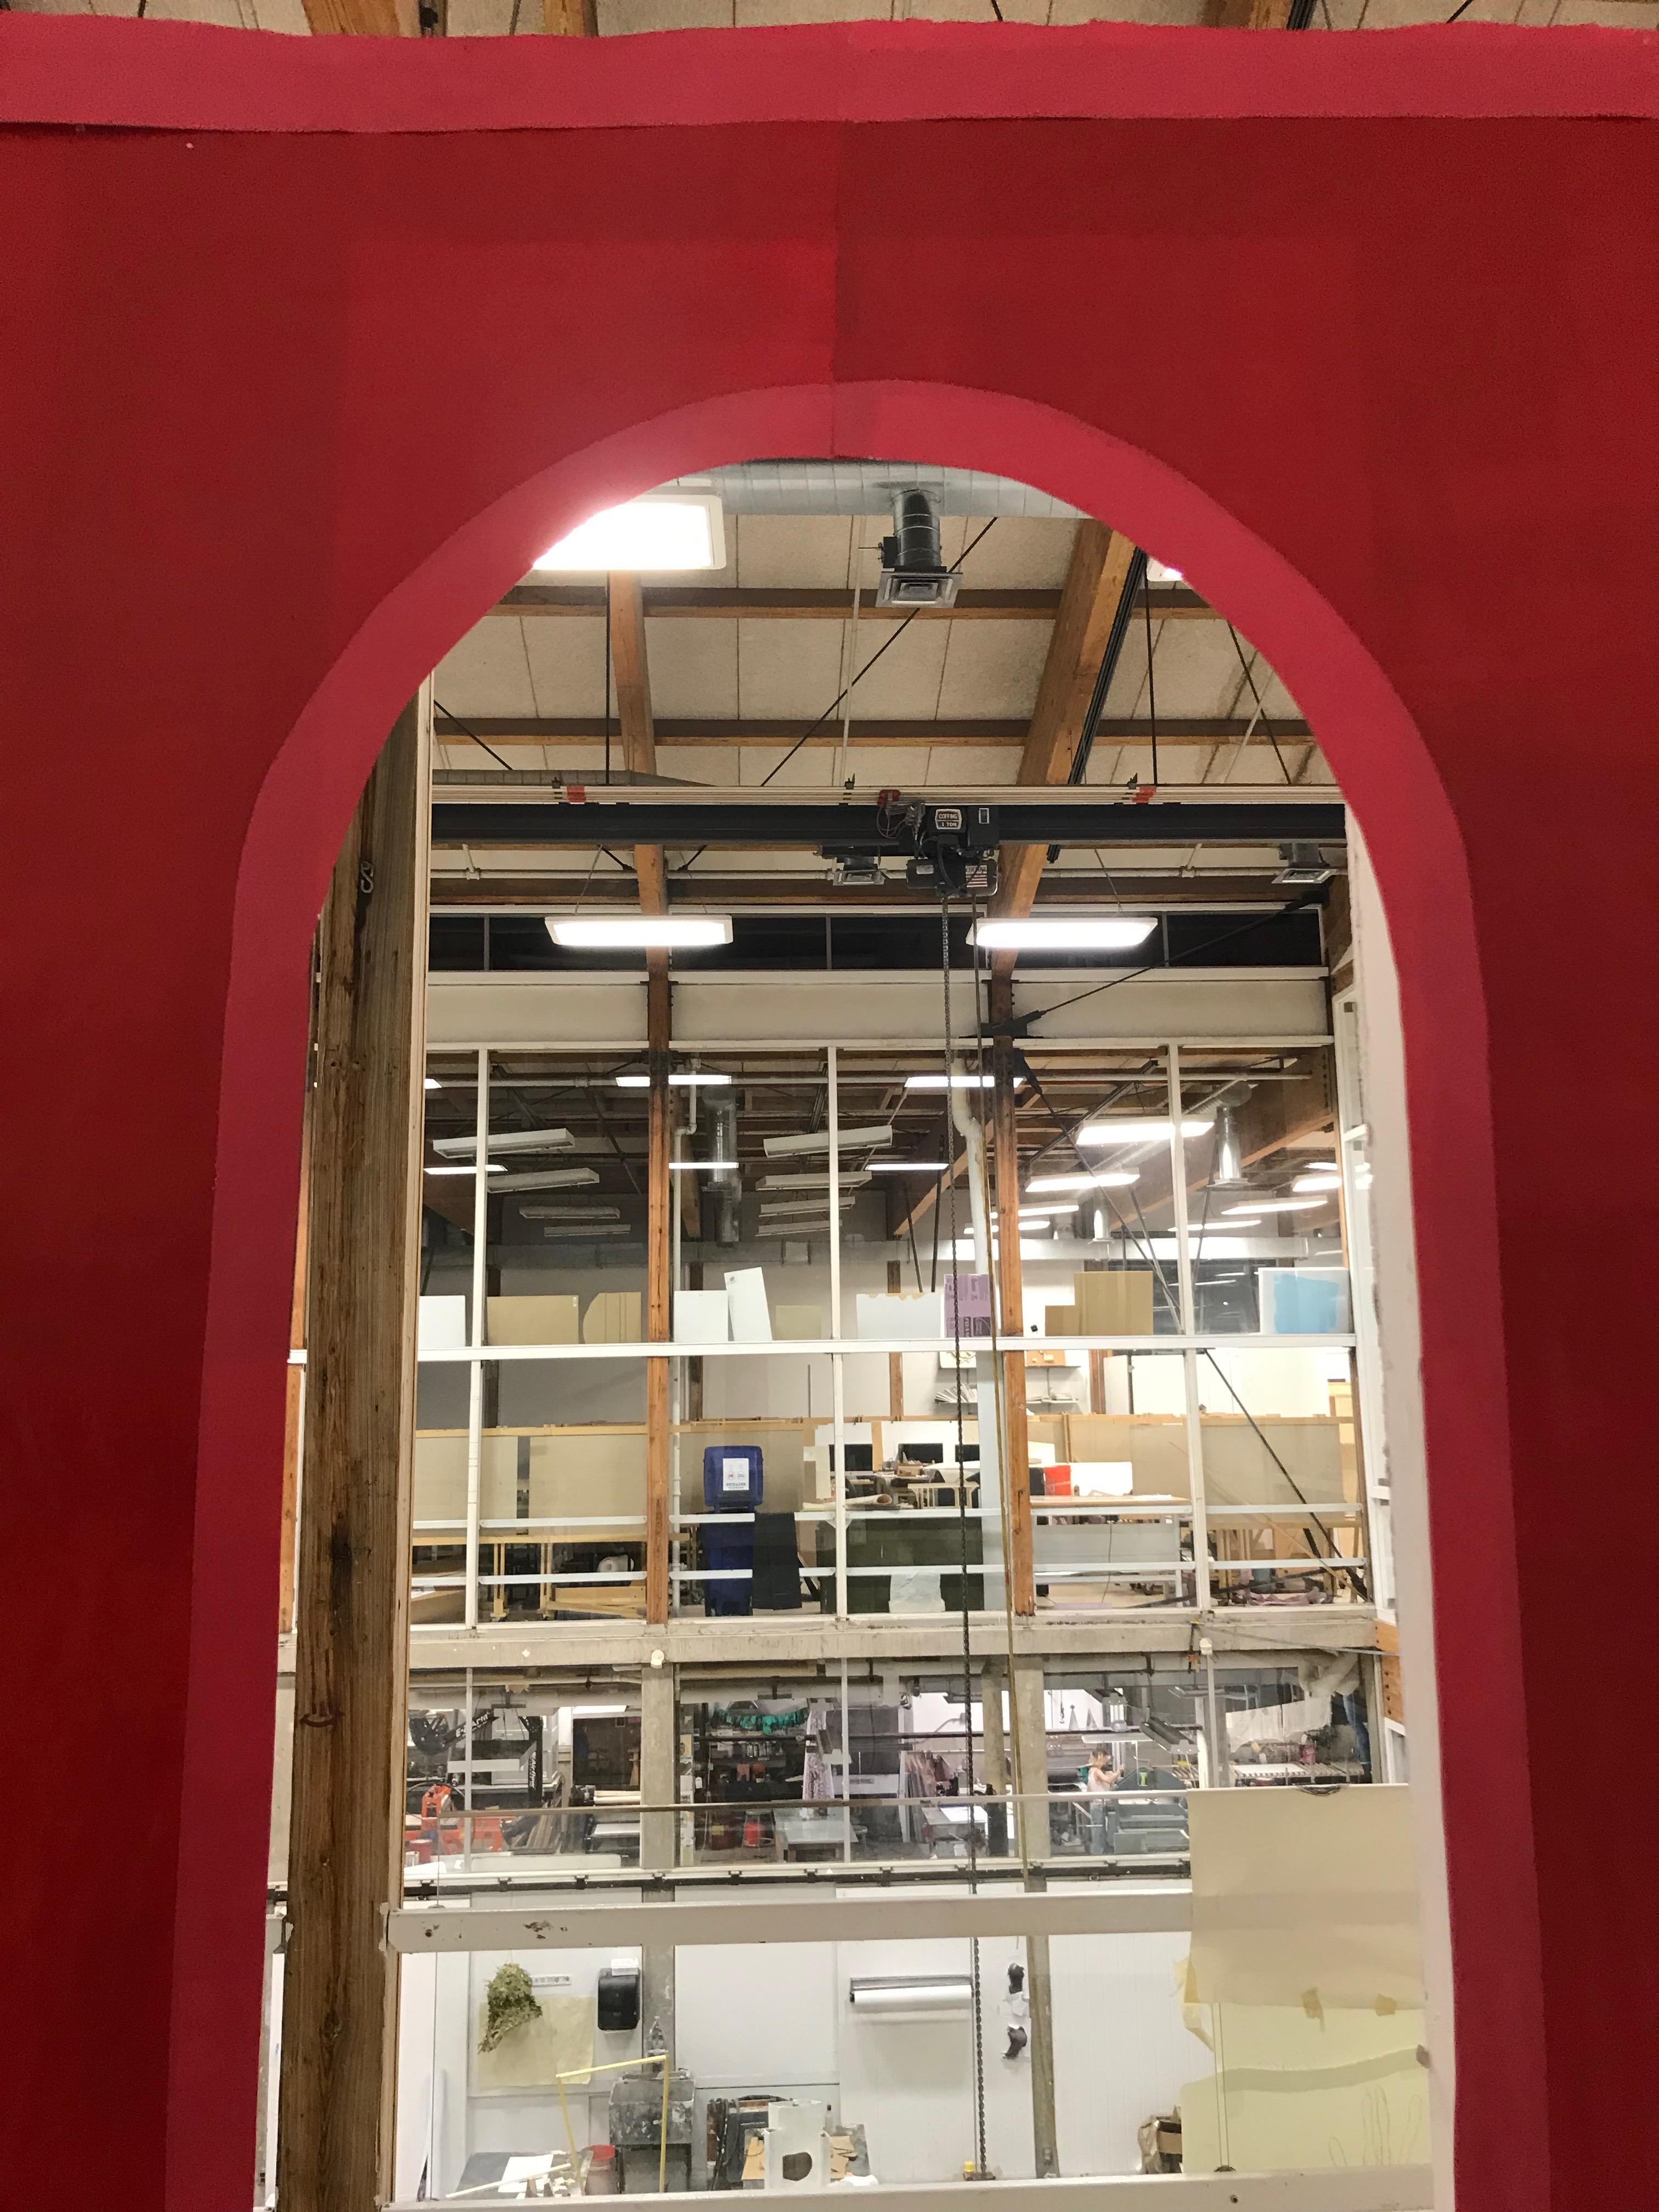 ahmad-yassir-artist-installation-red